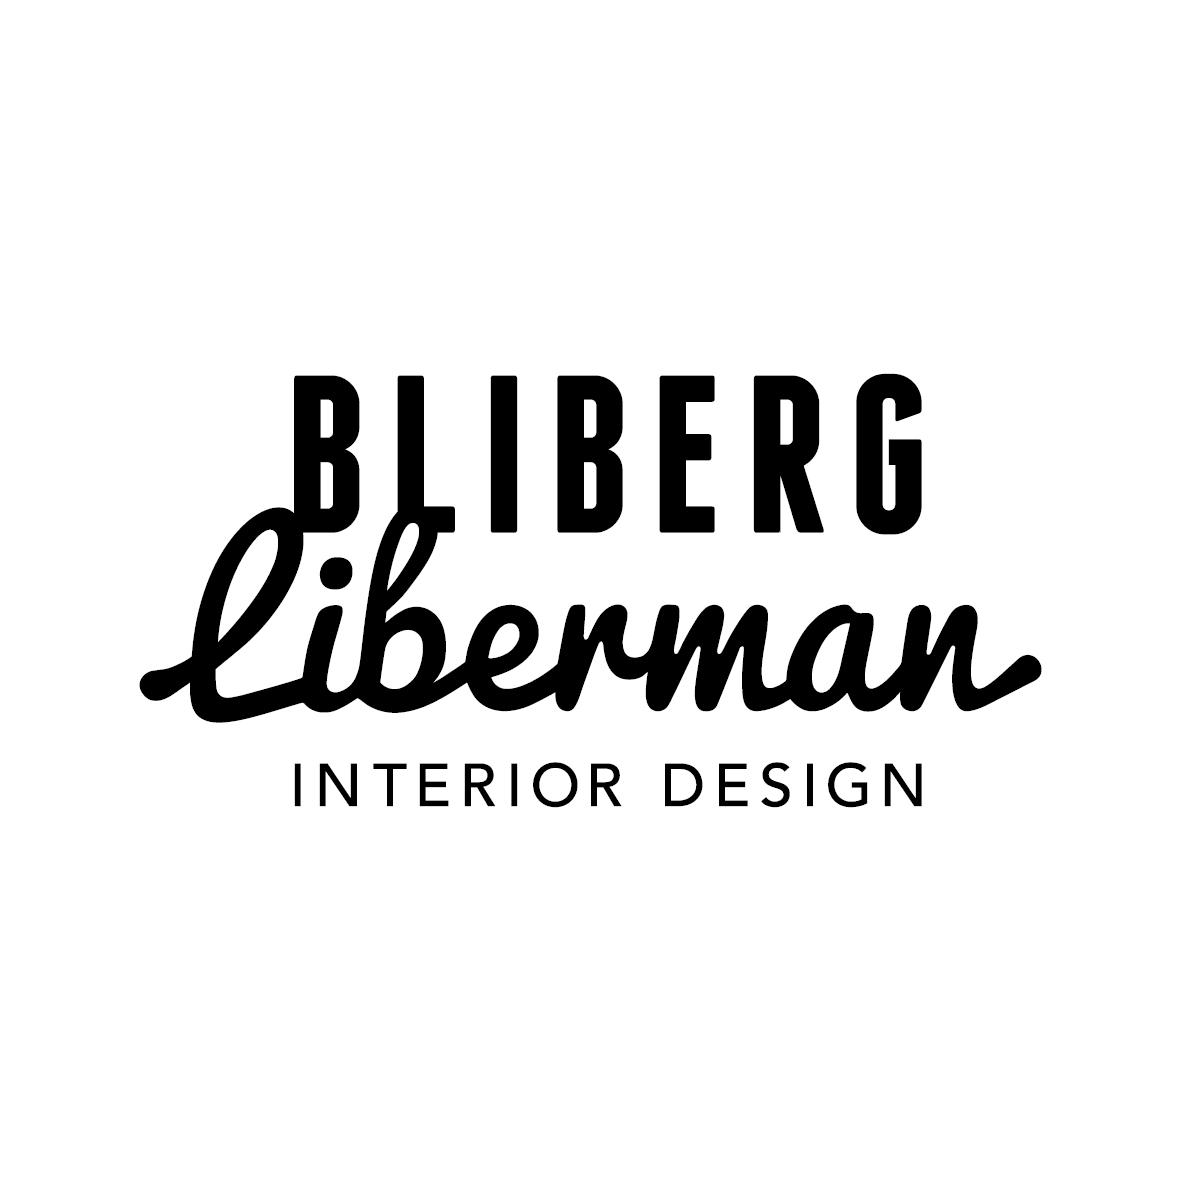 Logos_Michal Lifshitz Graphic Design__6.jpg